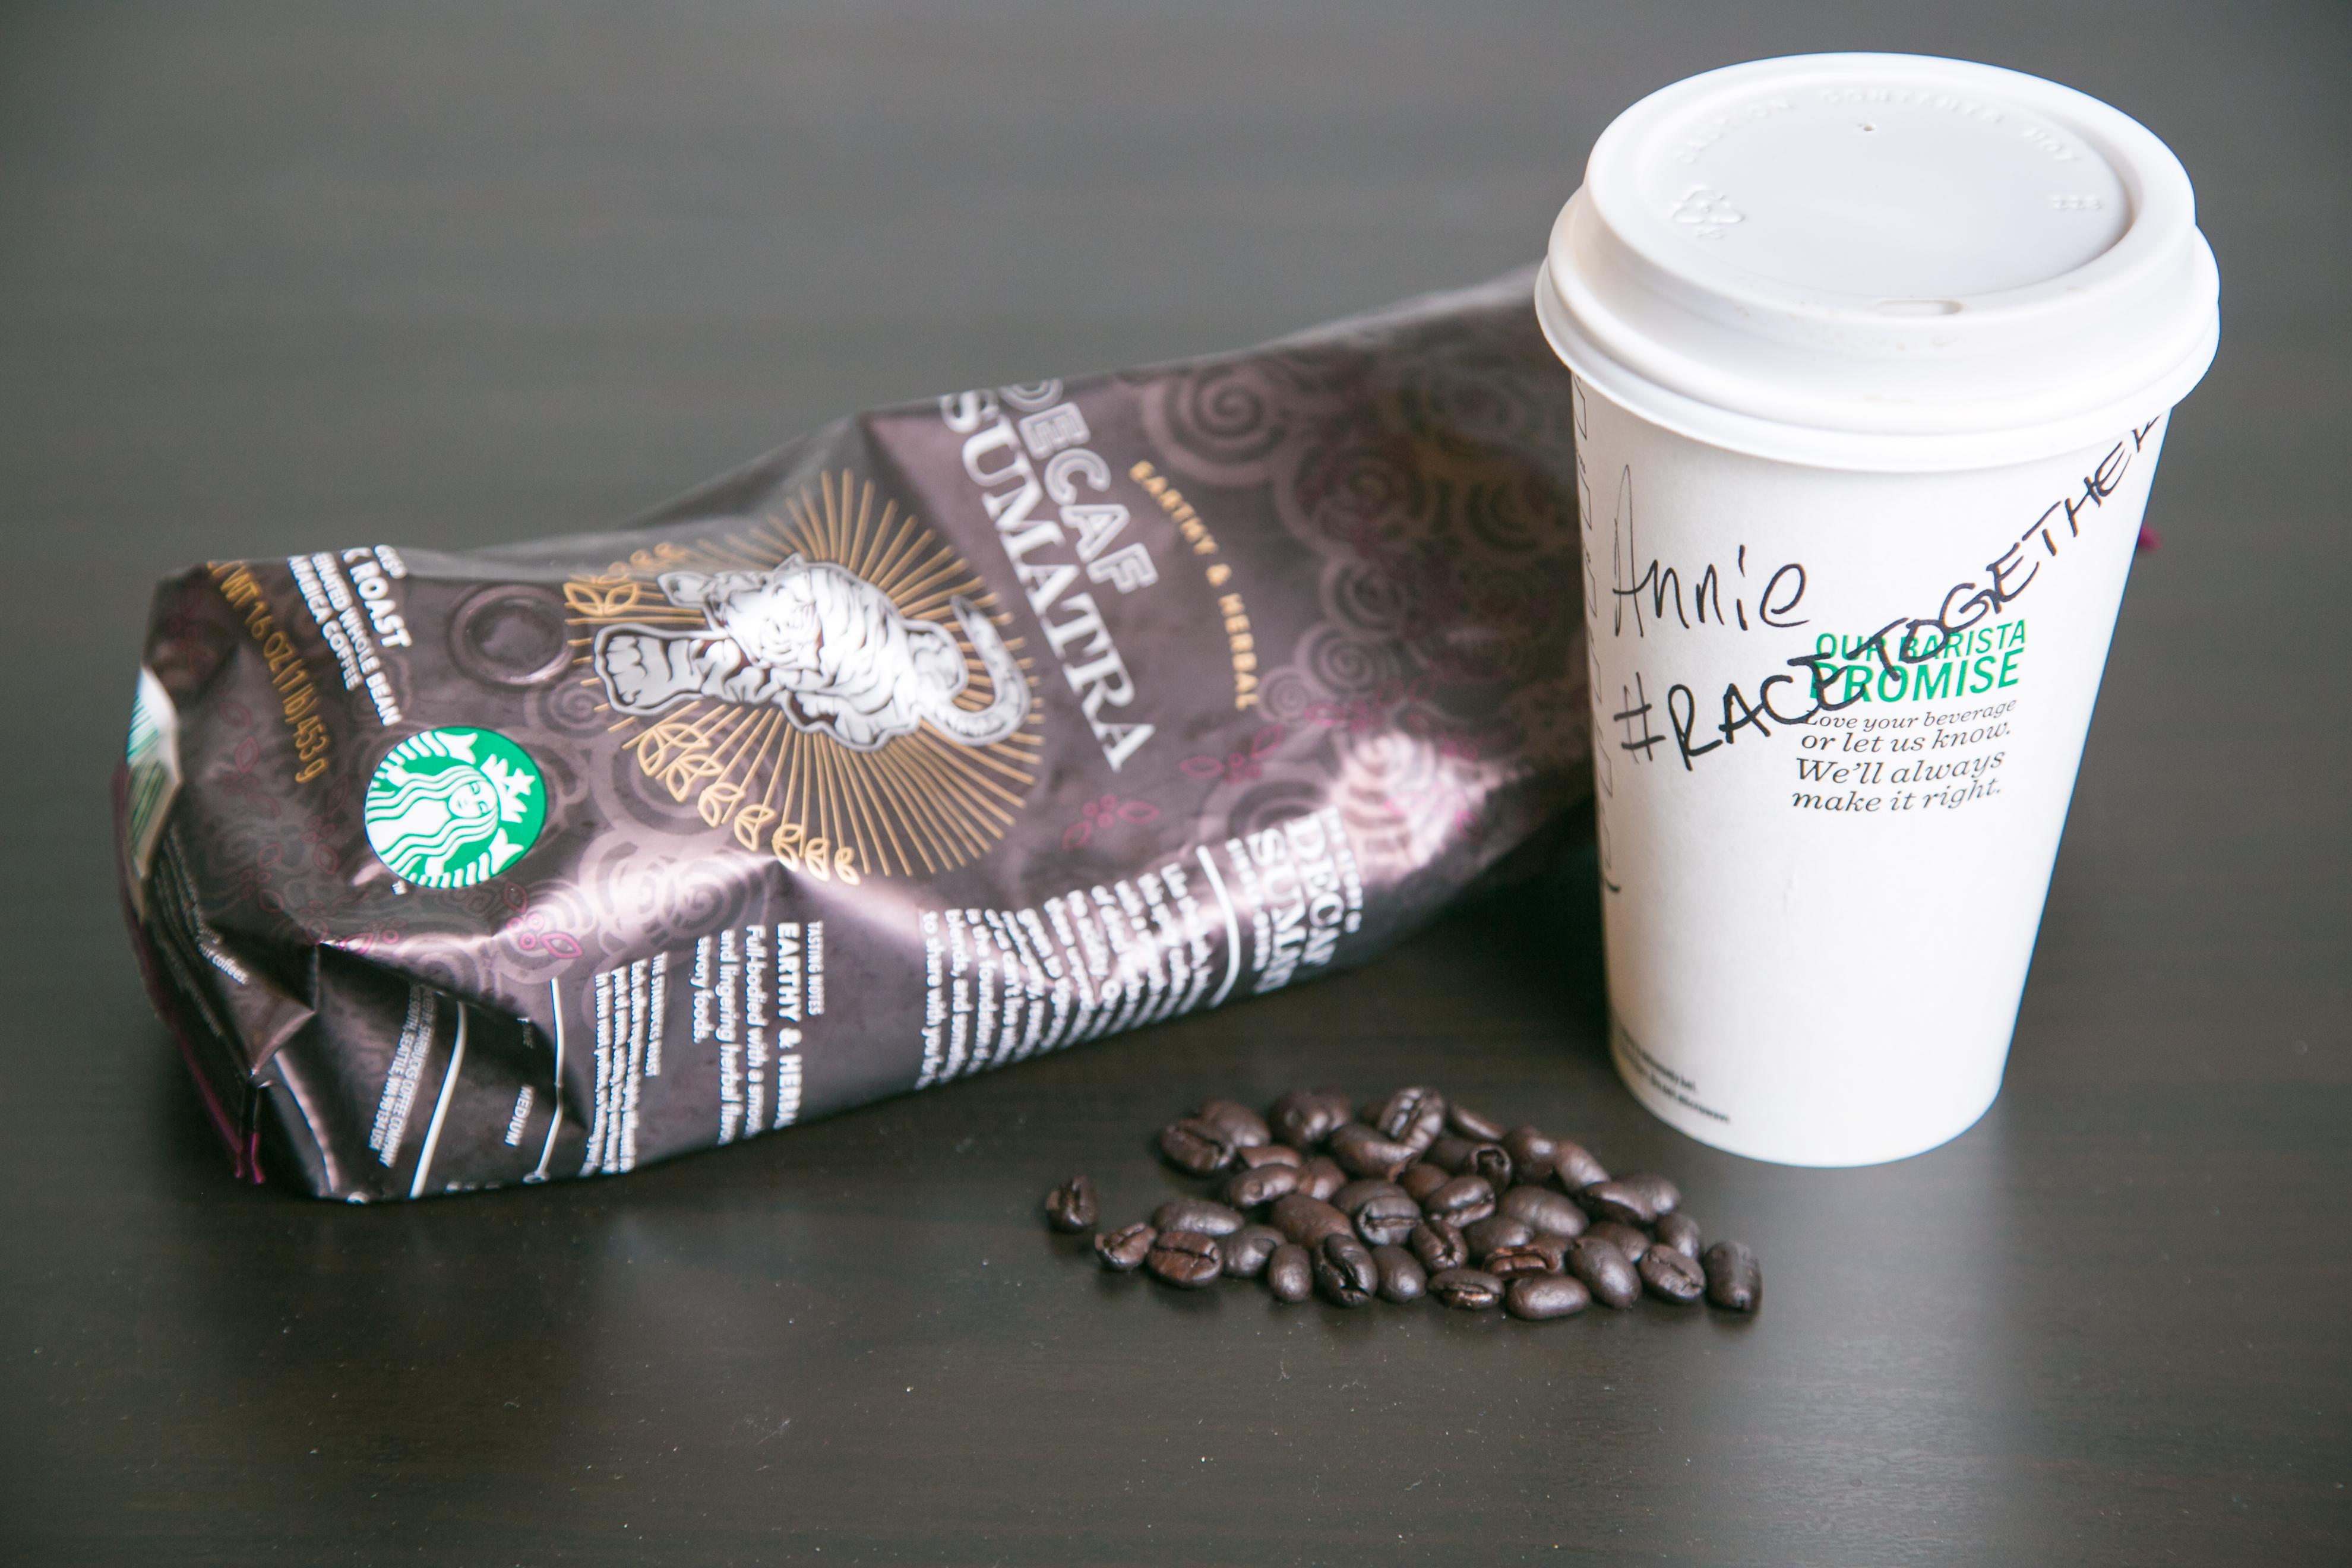 Swipe. Tap. Sip. Will It Work for Starbucks?